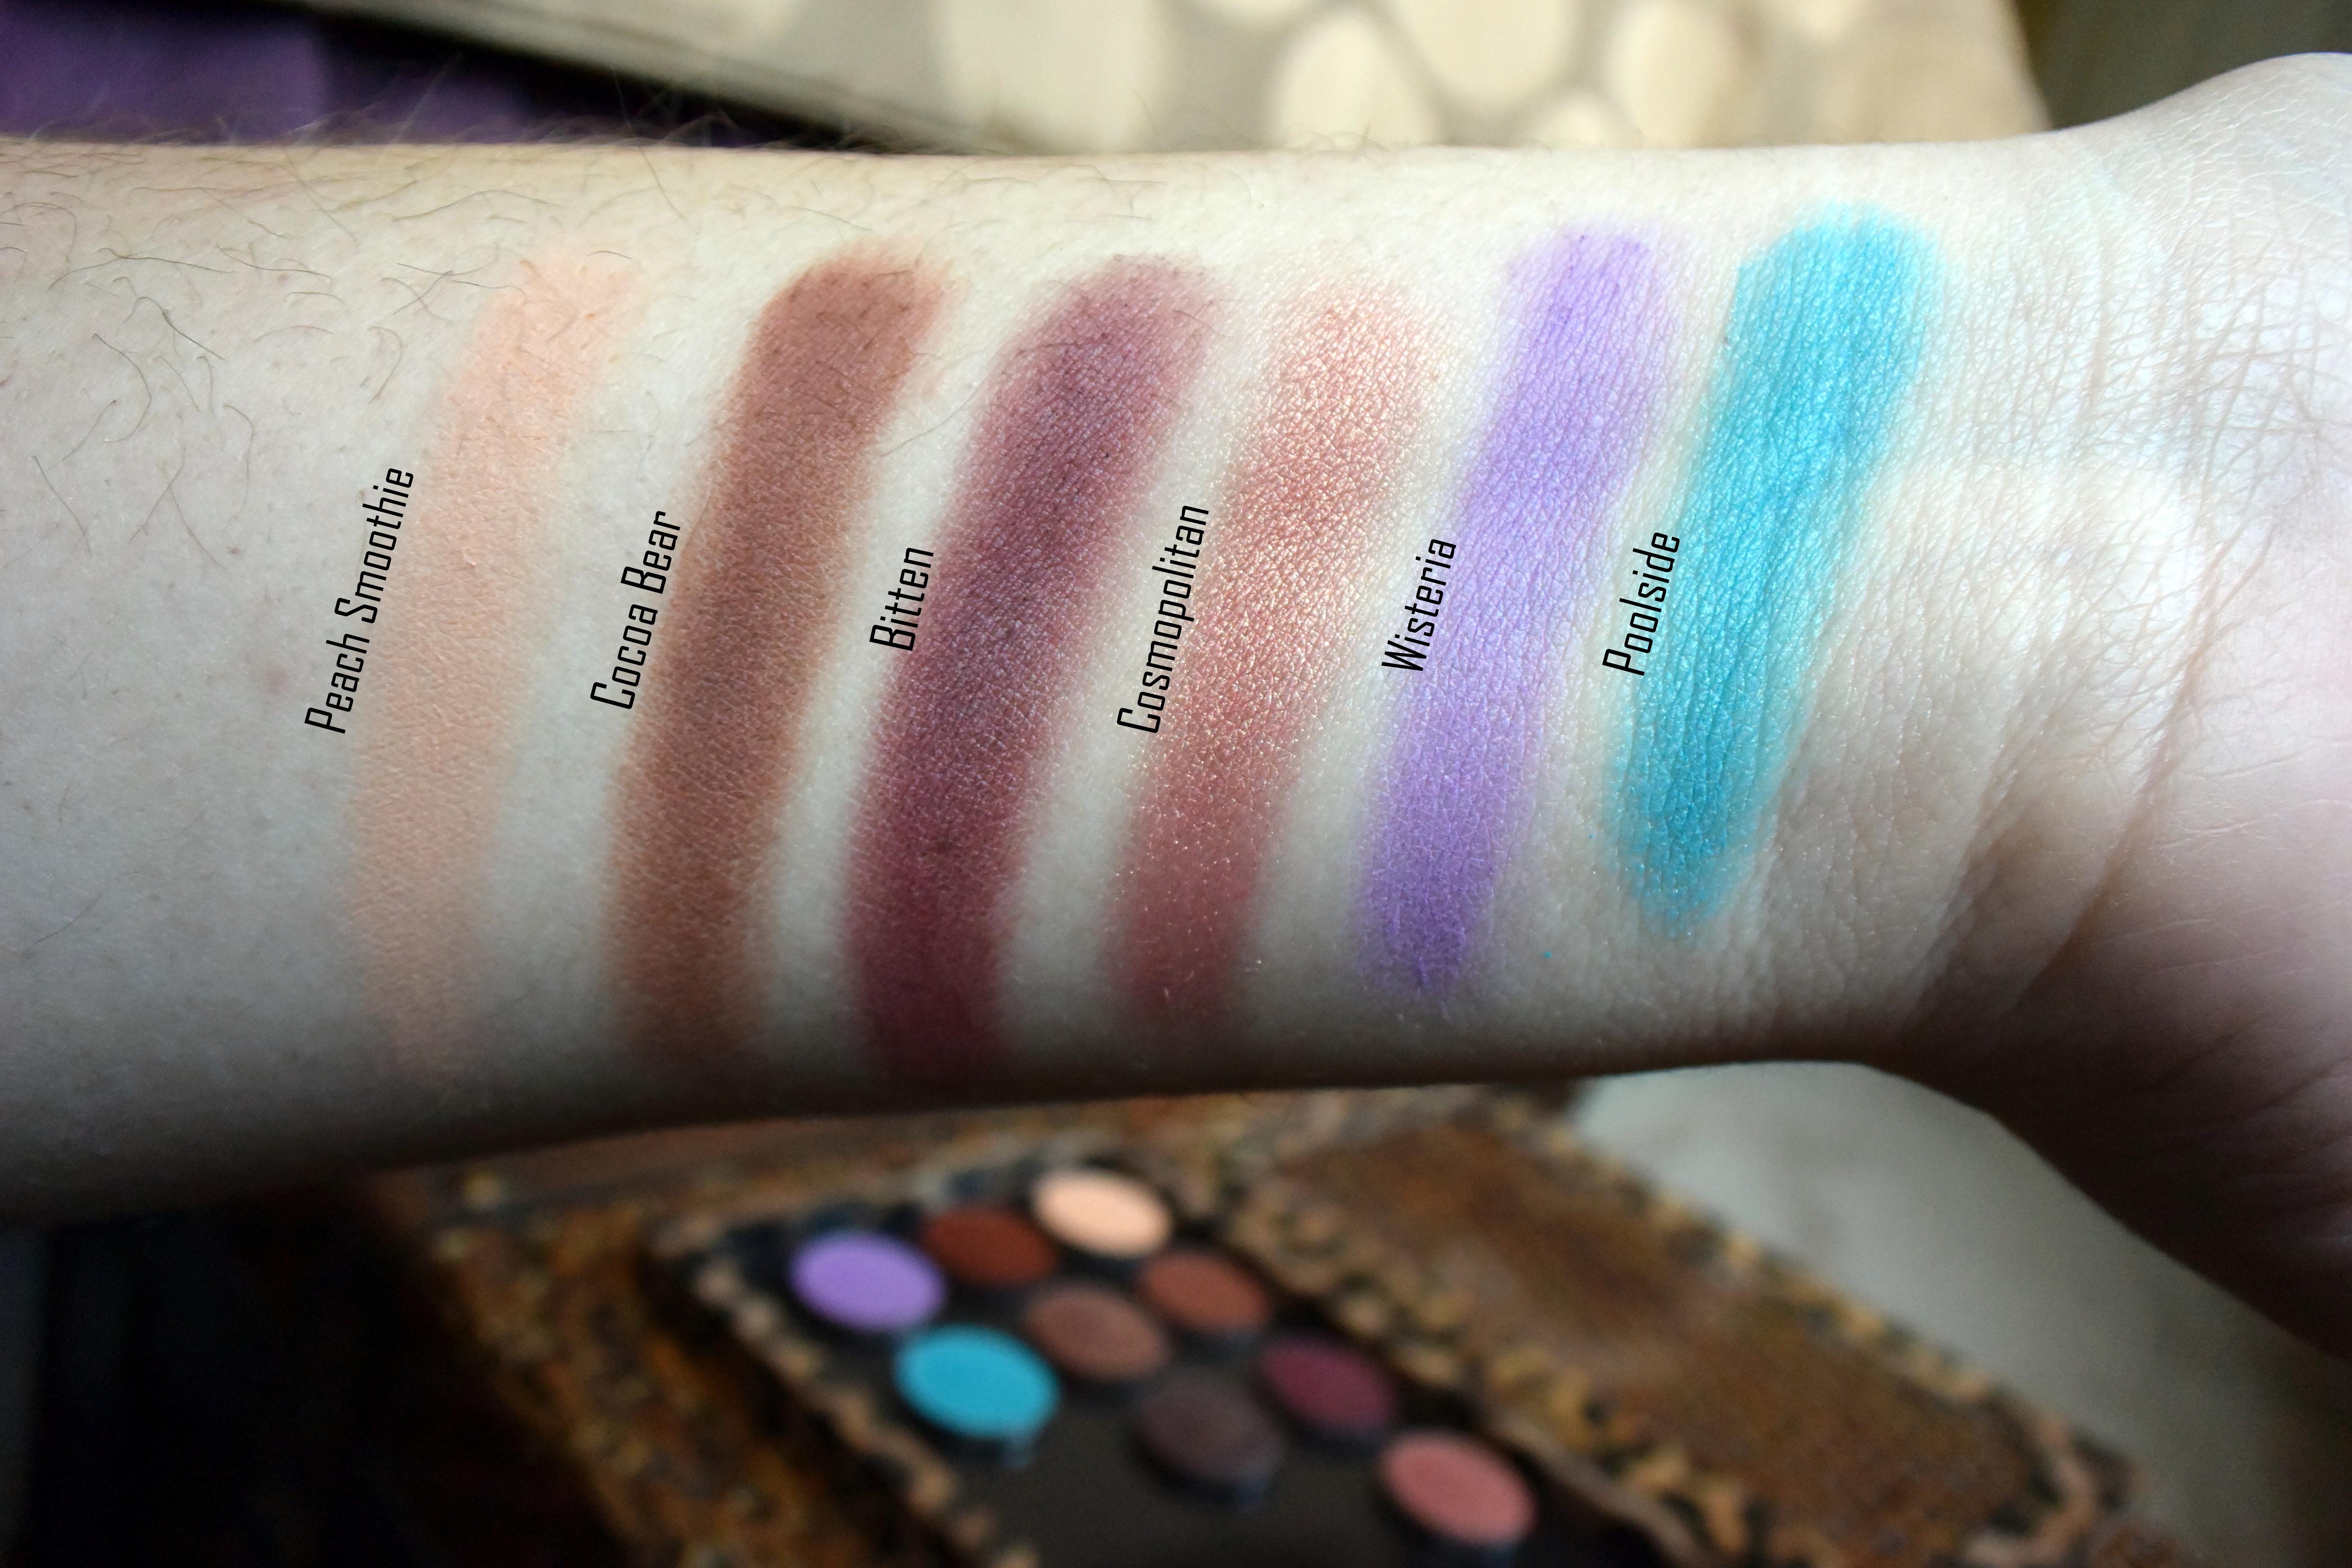 Makeup Geek Eye Shadow Haul, very comparable to MAC eye shadows.